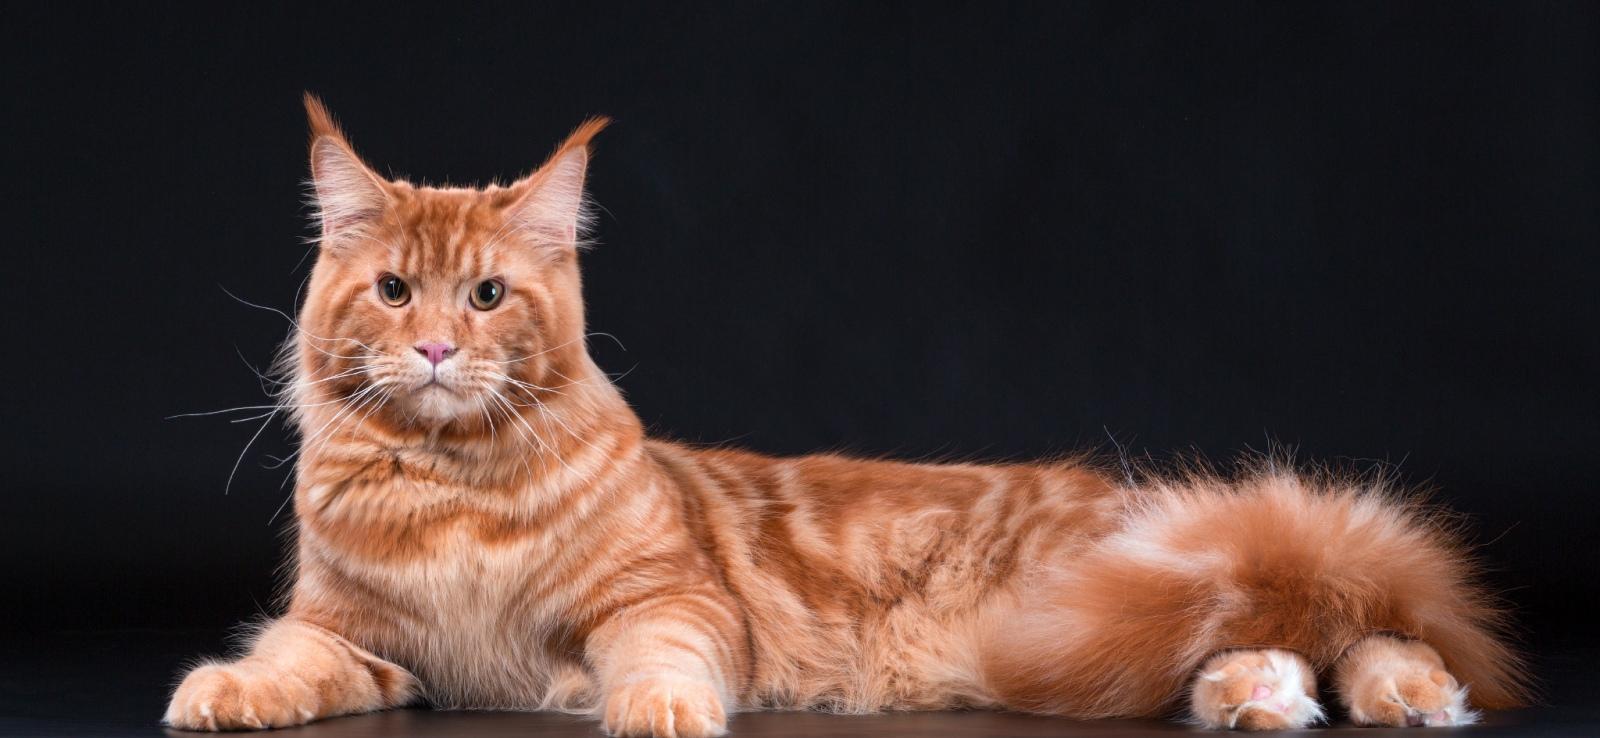 Кот на вязку - Артемида Шерхан (MCO). Окрас - красный мрамор